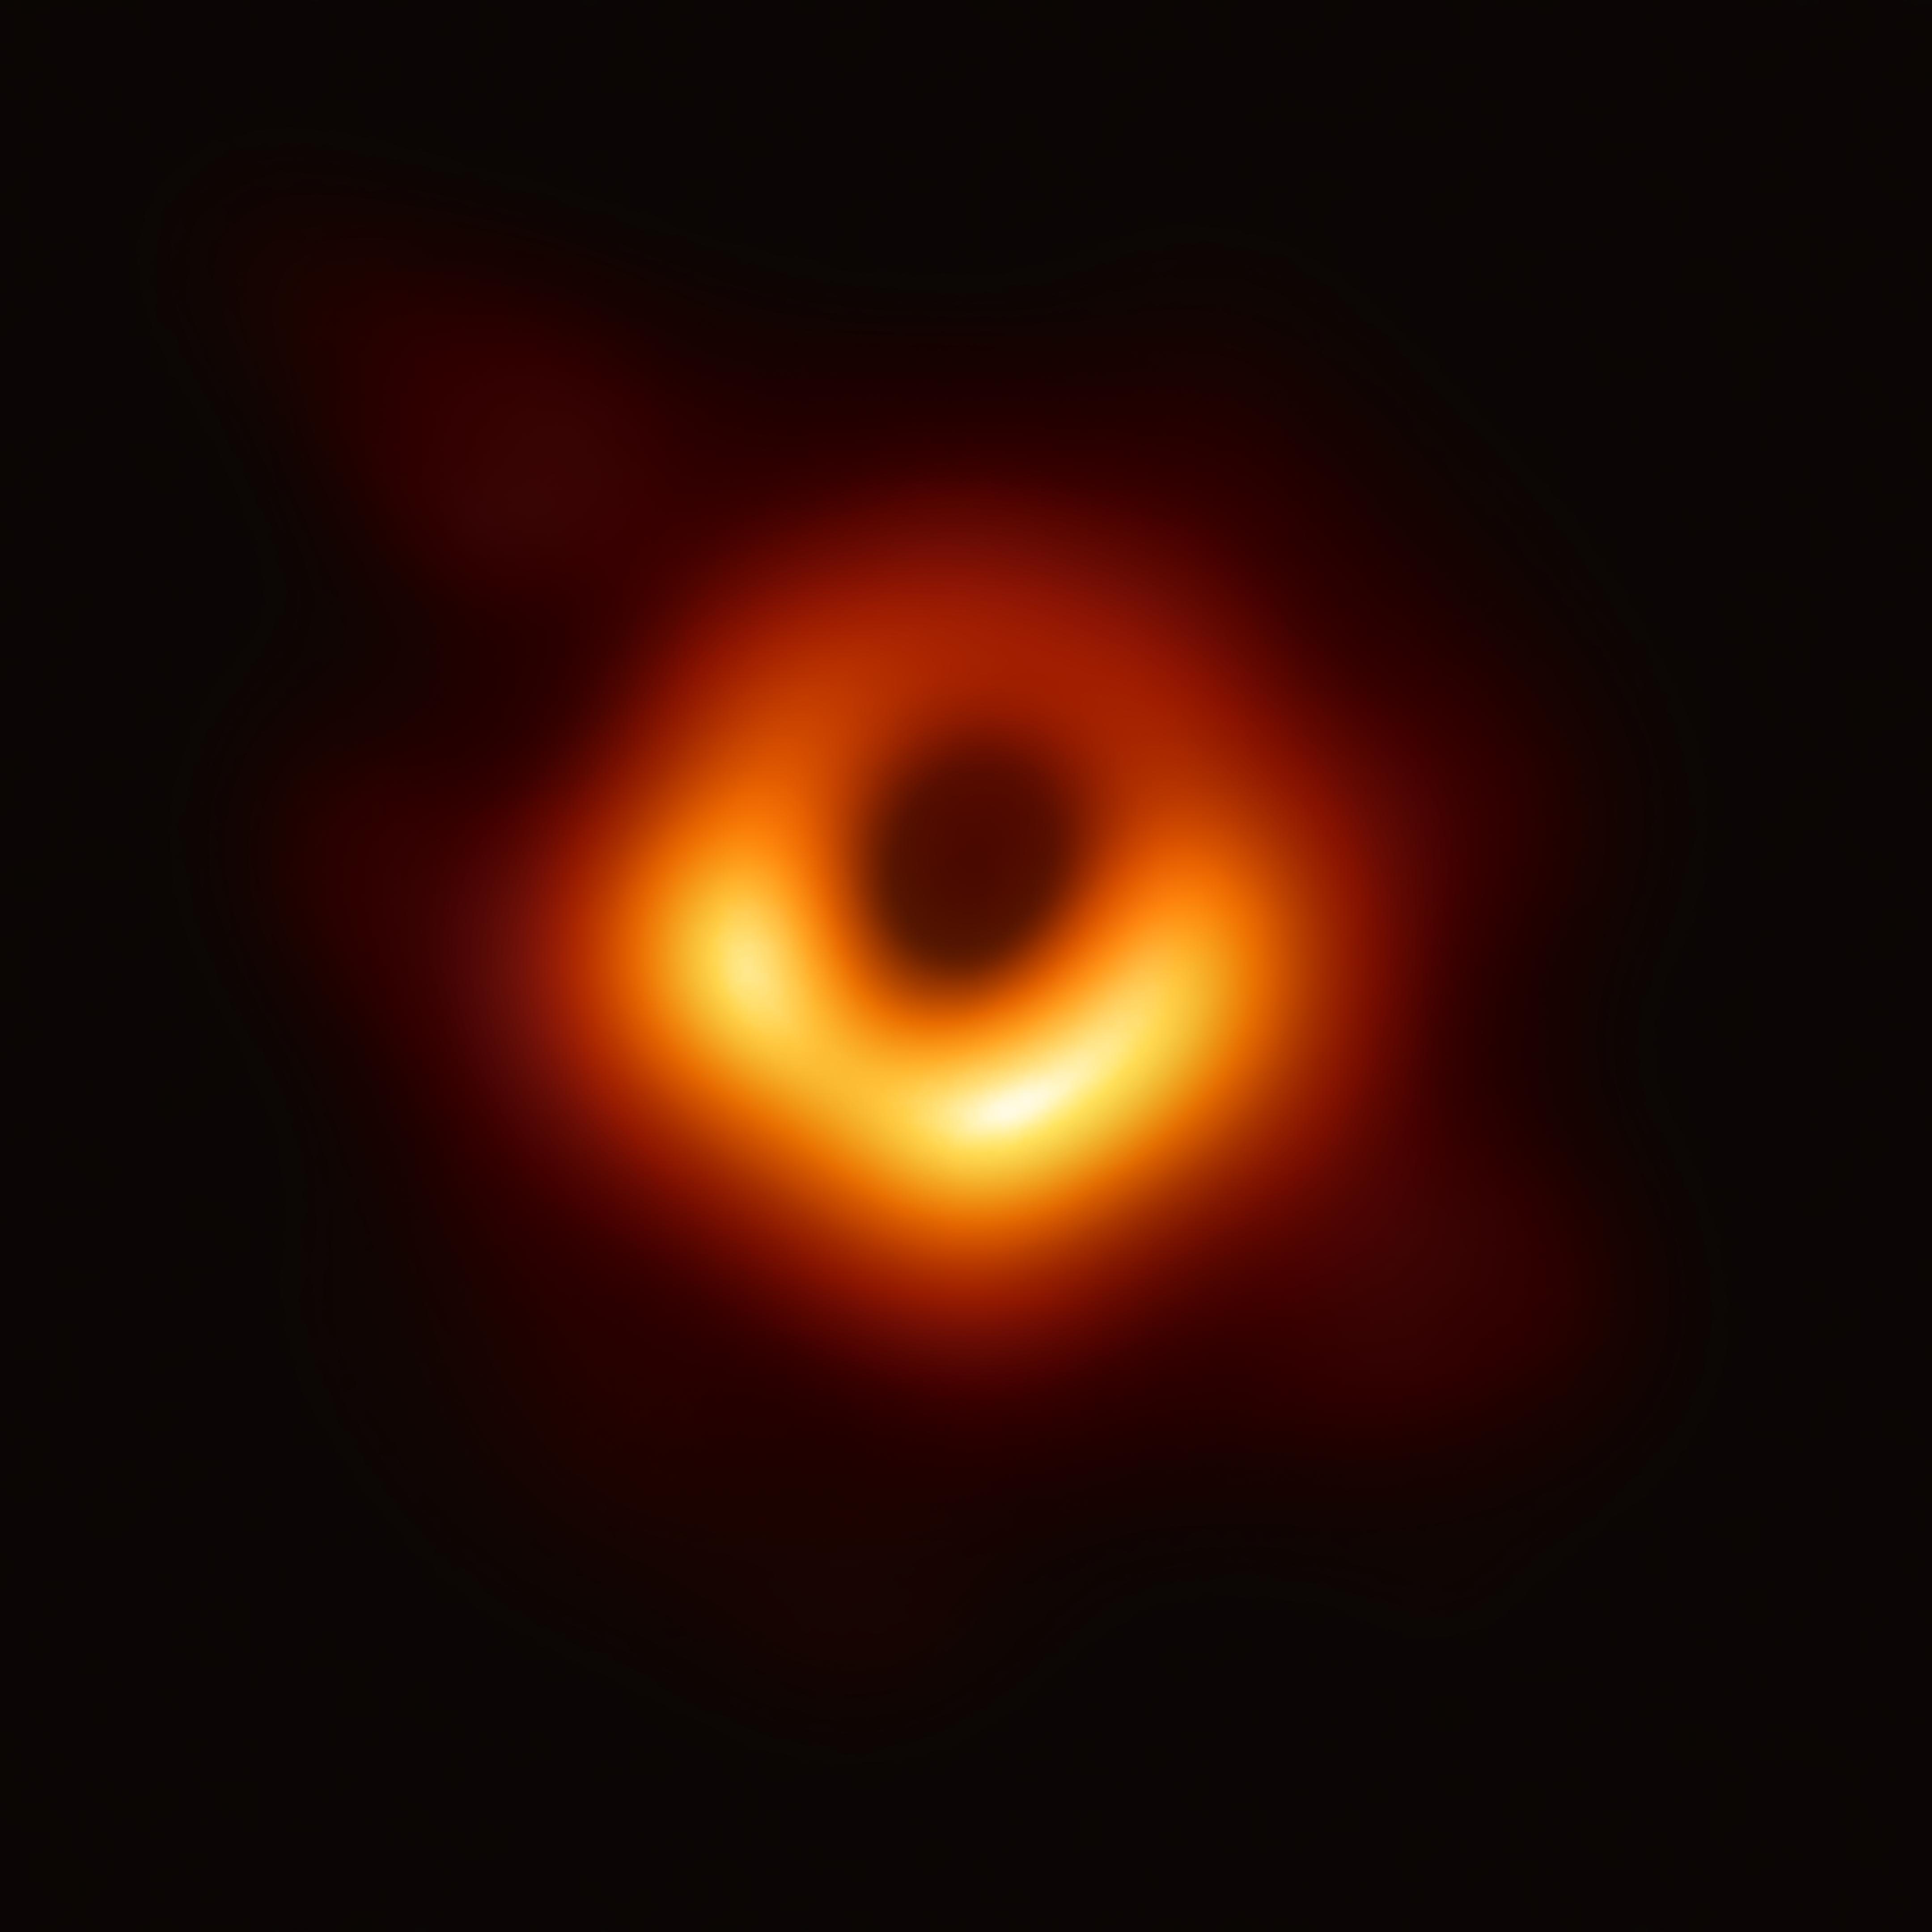 Black_hole_-_Messier_87_crop_max_res